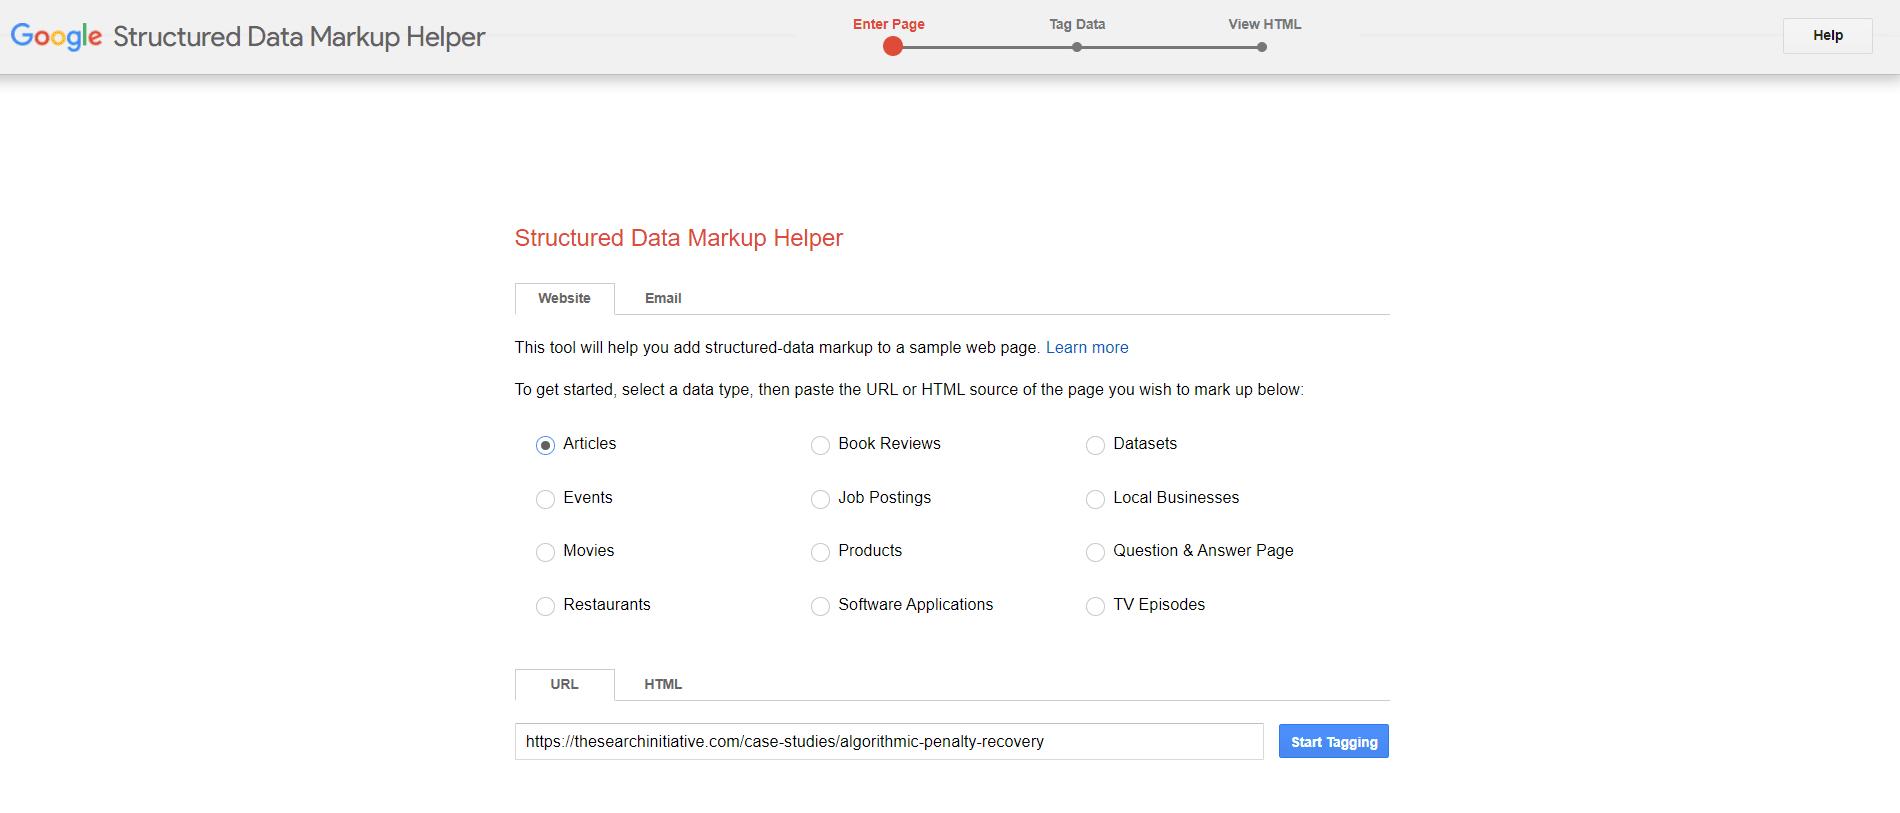 google structured data markup helper dashboard